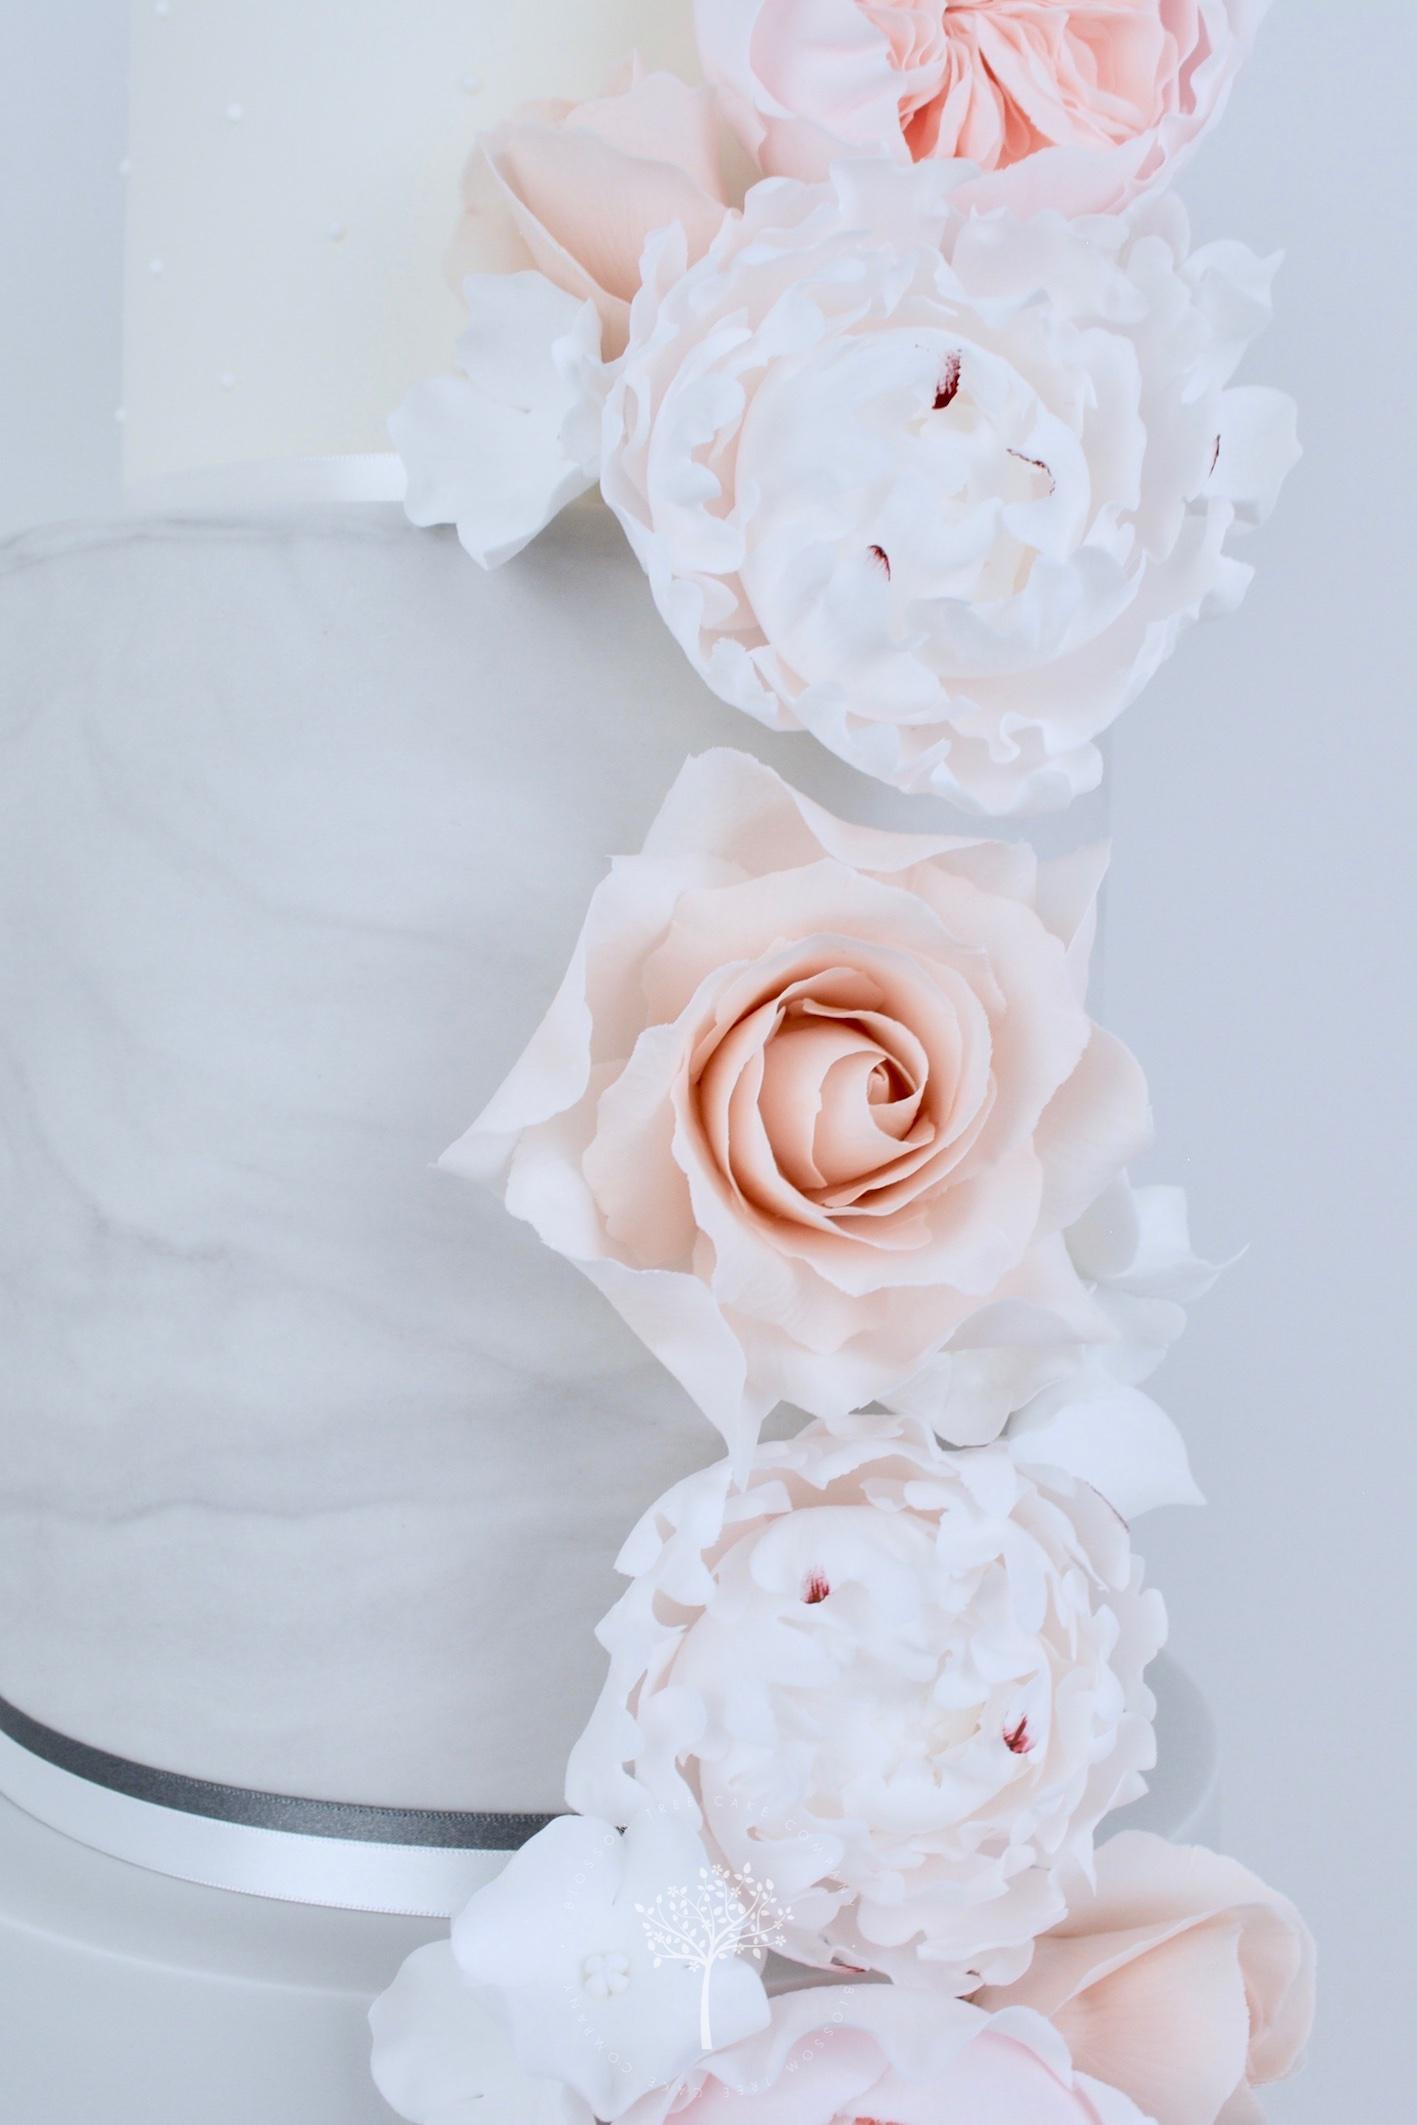 Nude Roses & Peony wedding cake by Blossom Tree Cake Company Harrogate North Yorkshire - sugar gardenia peonies.jpg